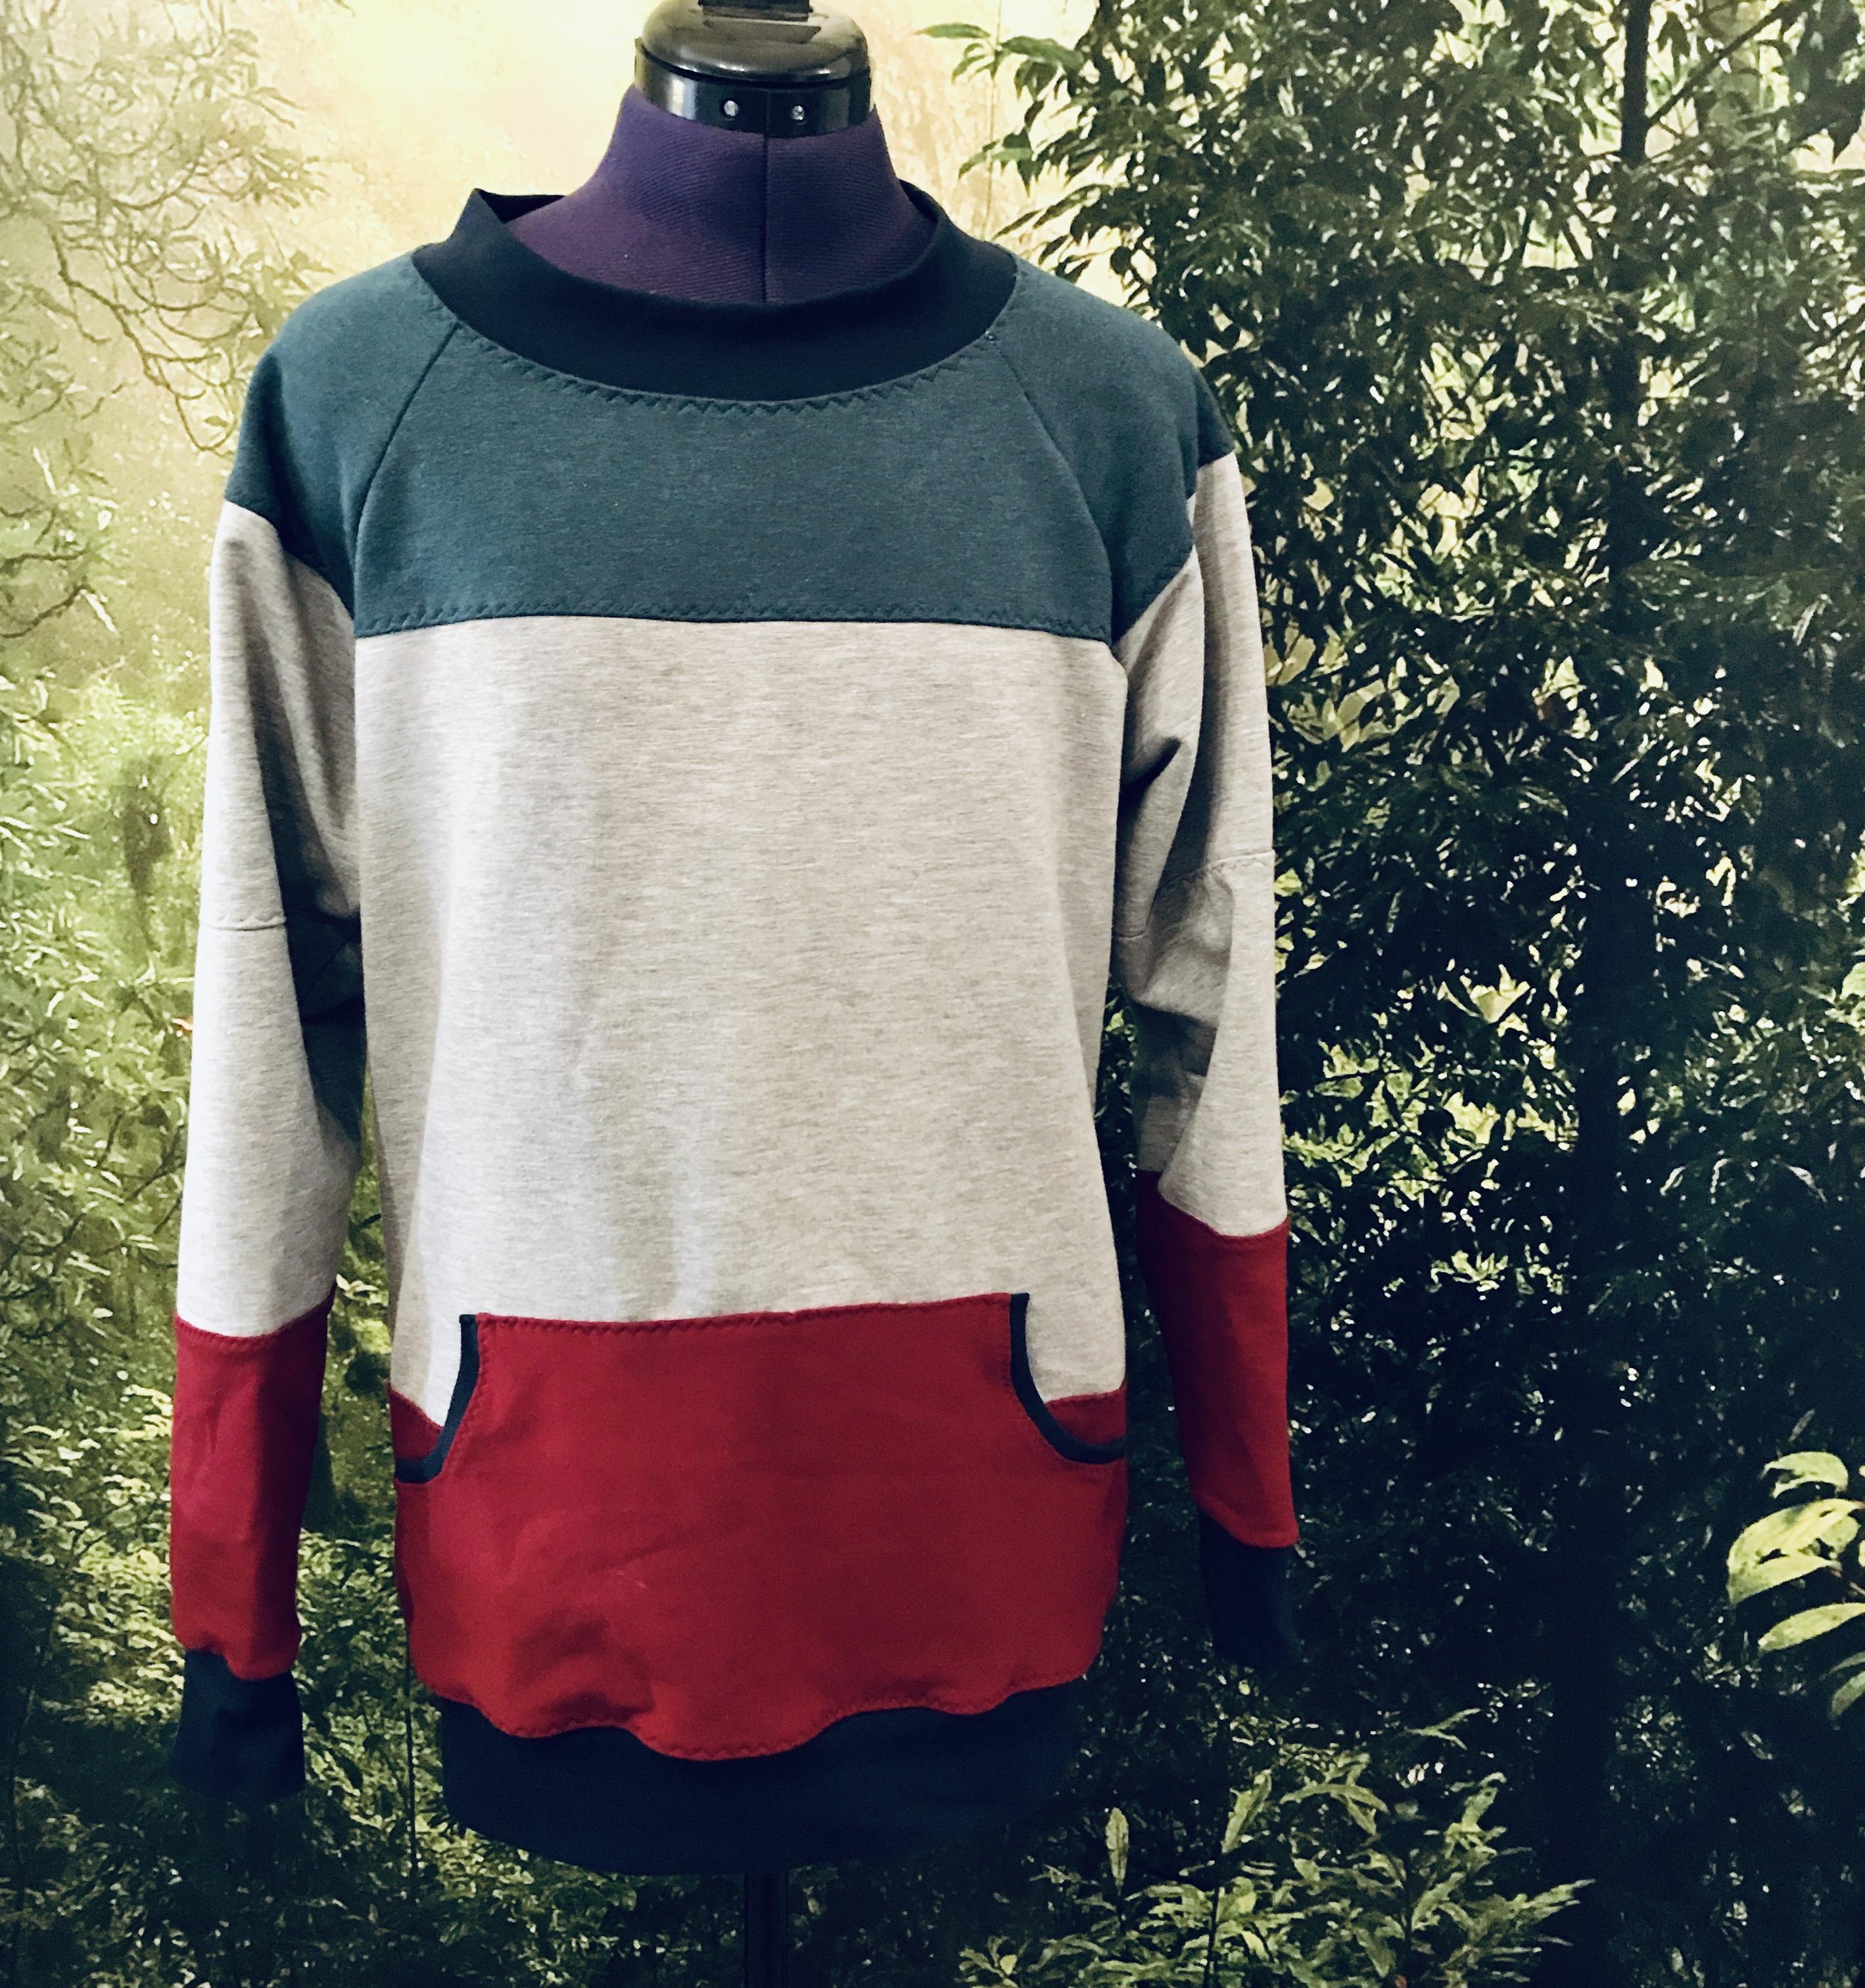 Heather Sweatshirt Pattern Hack: Colour Block